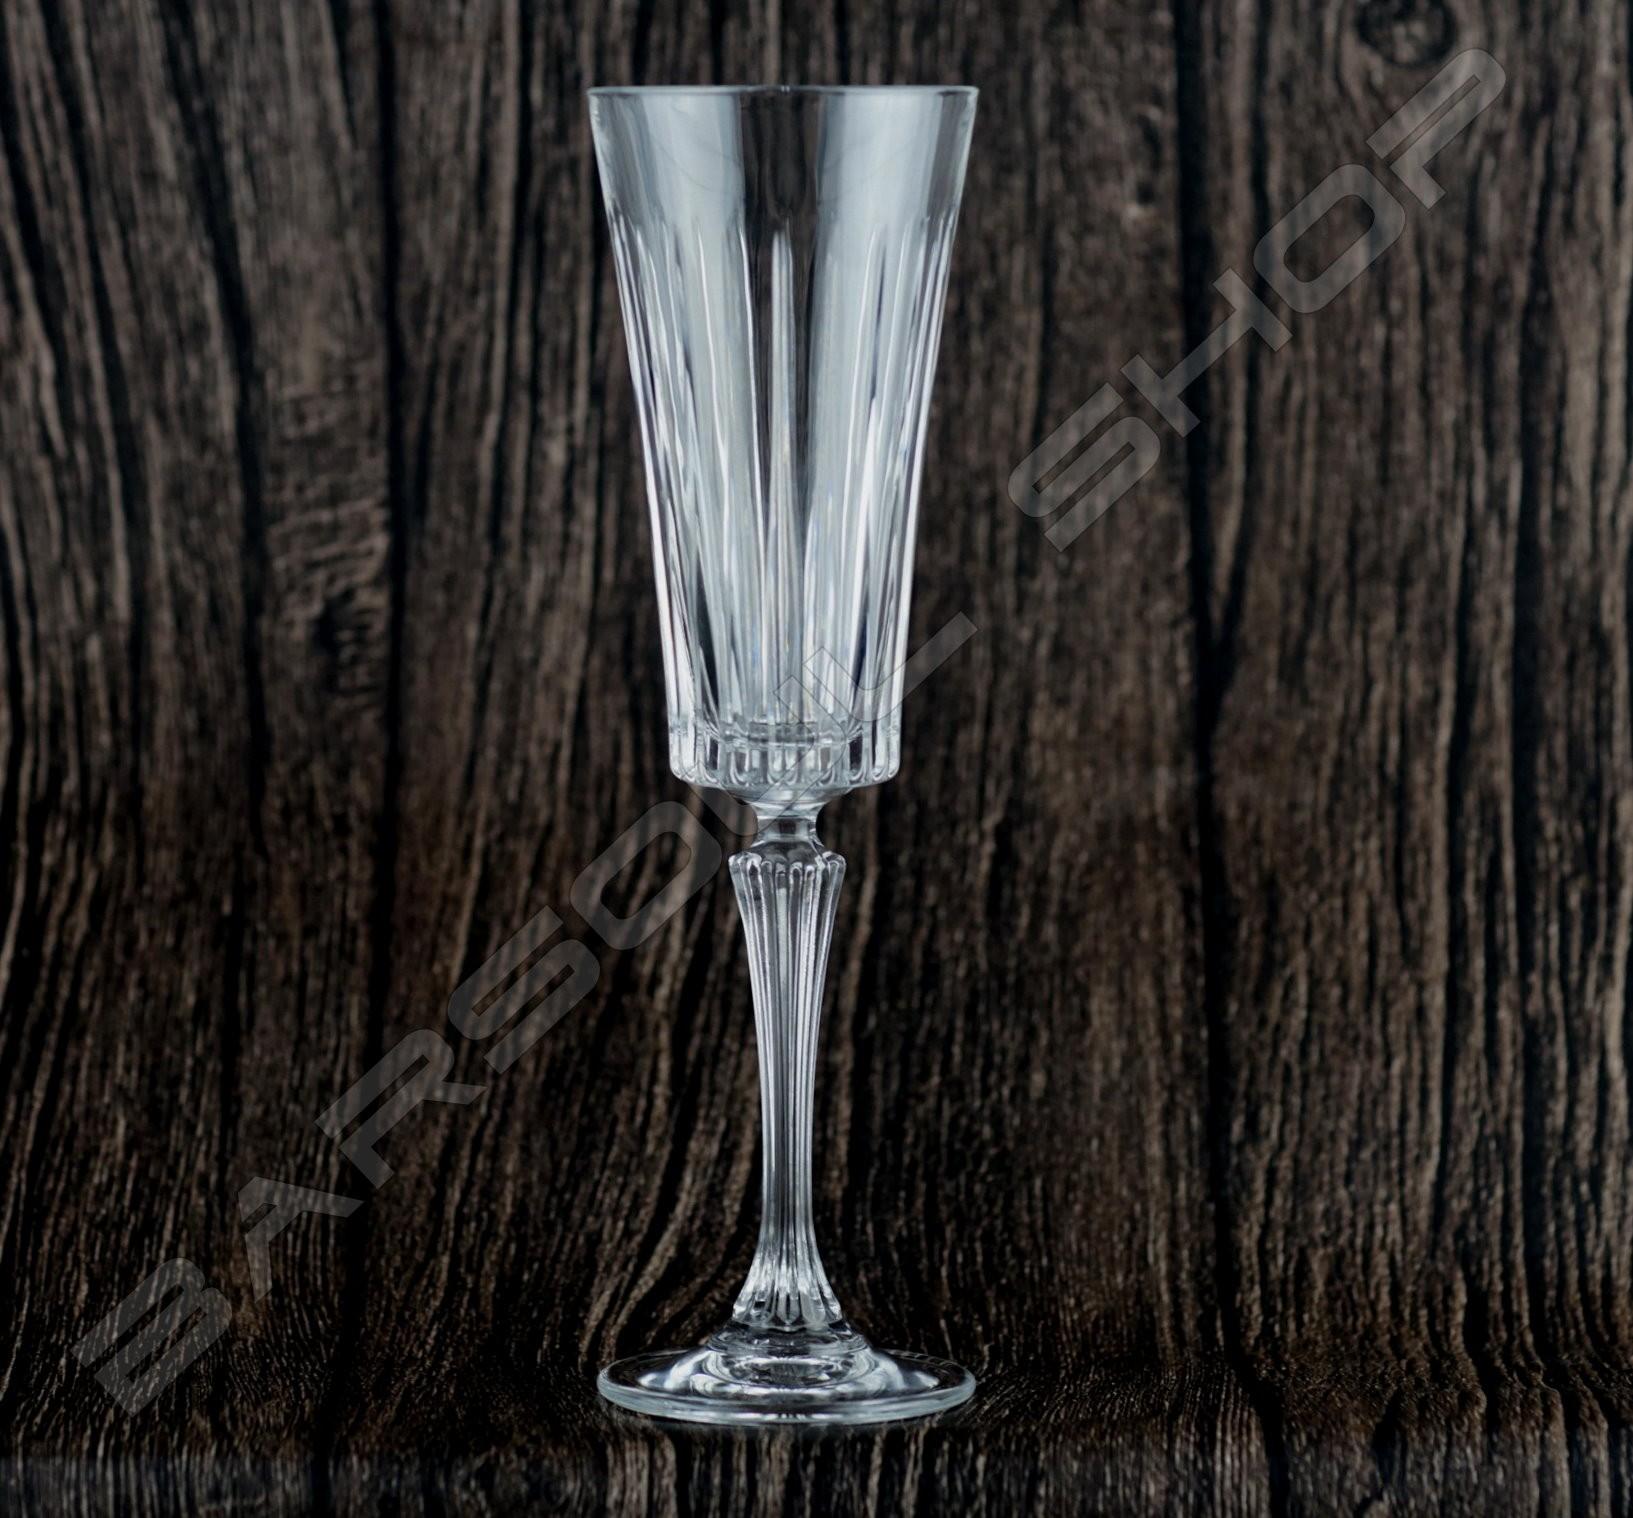 義大利無鉛水晶香檳杯210ml 6pcs Italy RCR champagne cup